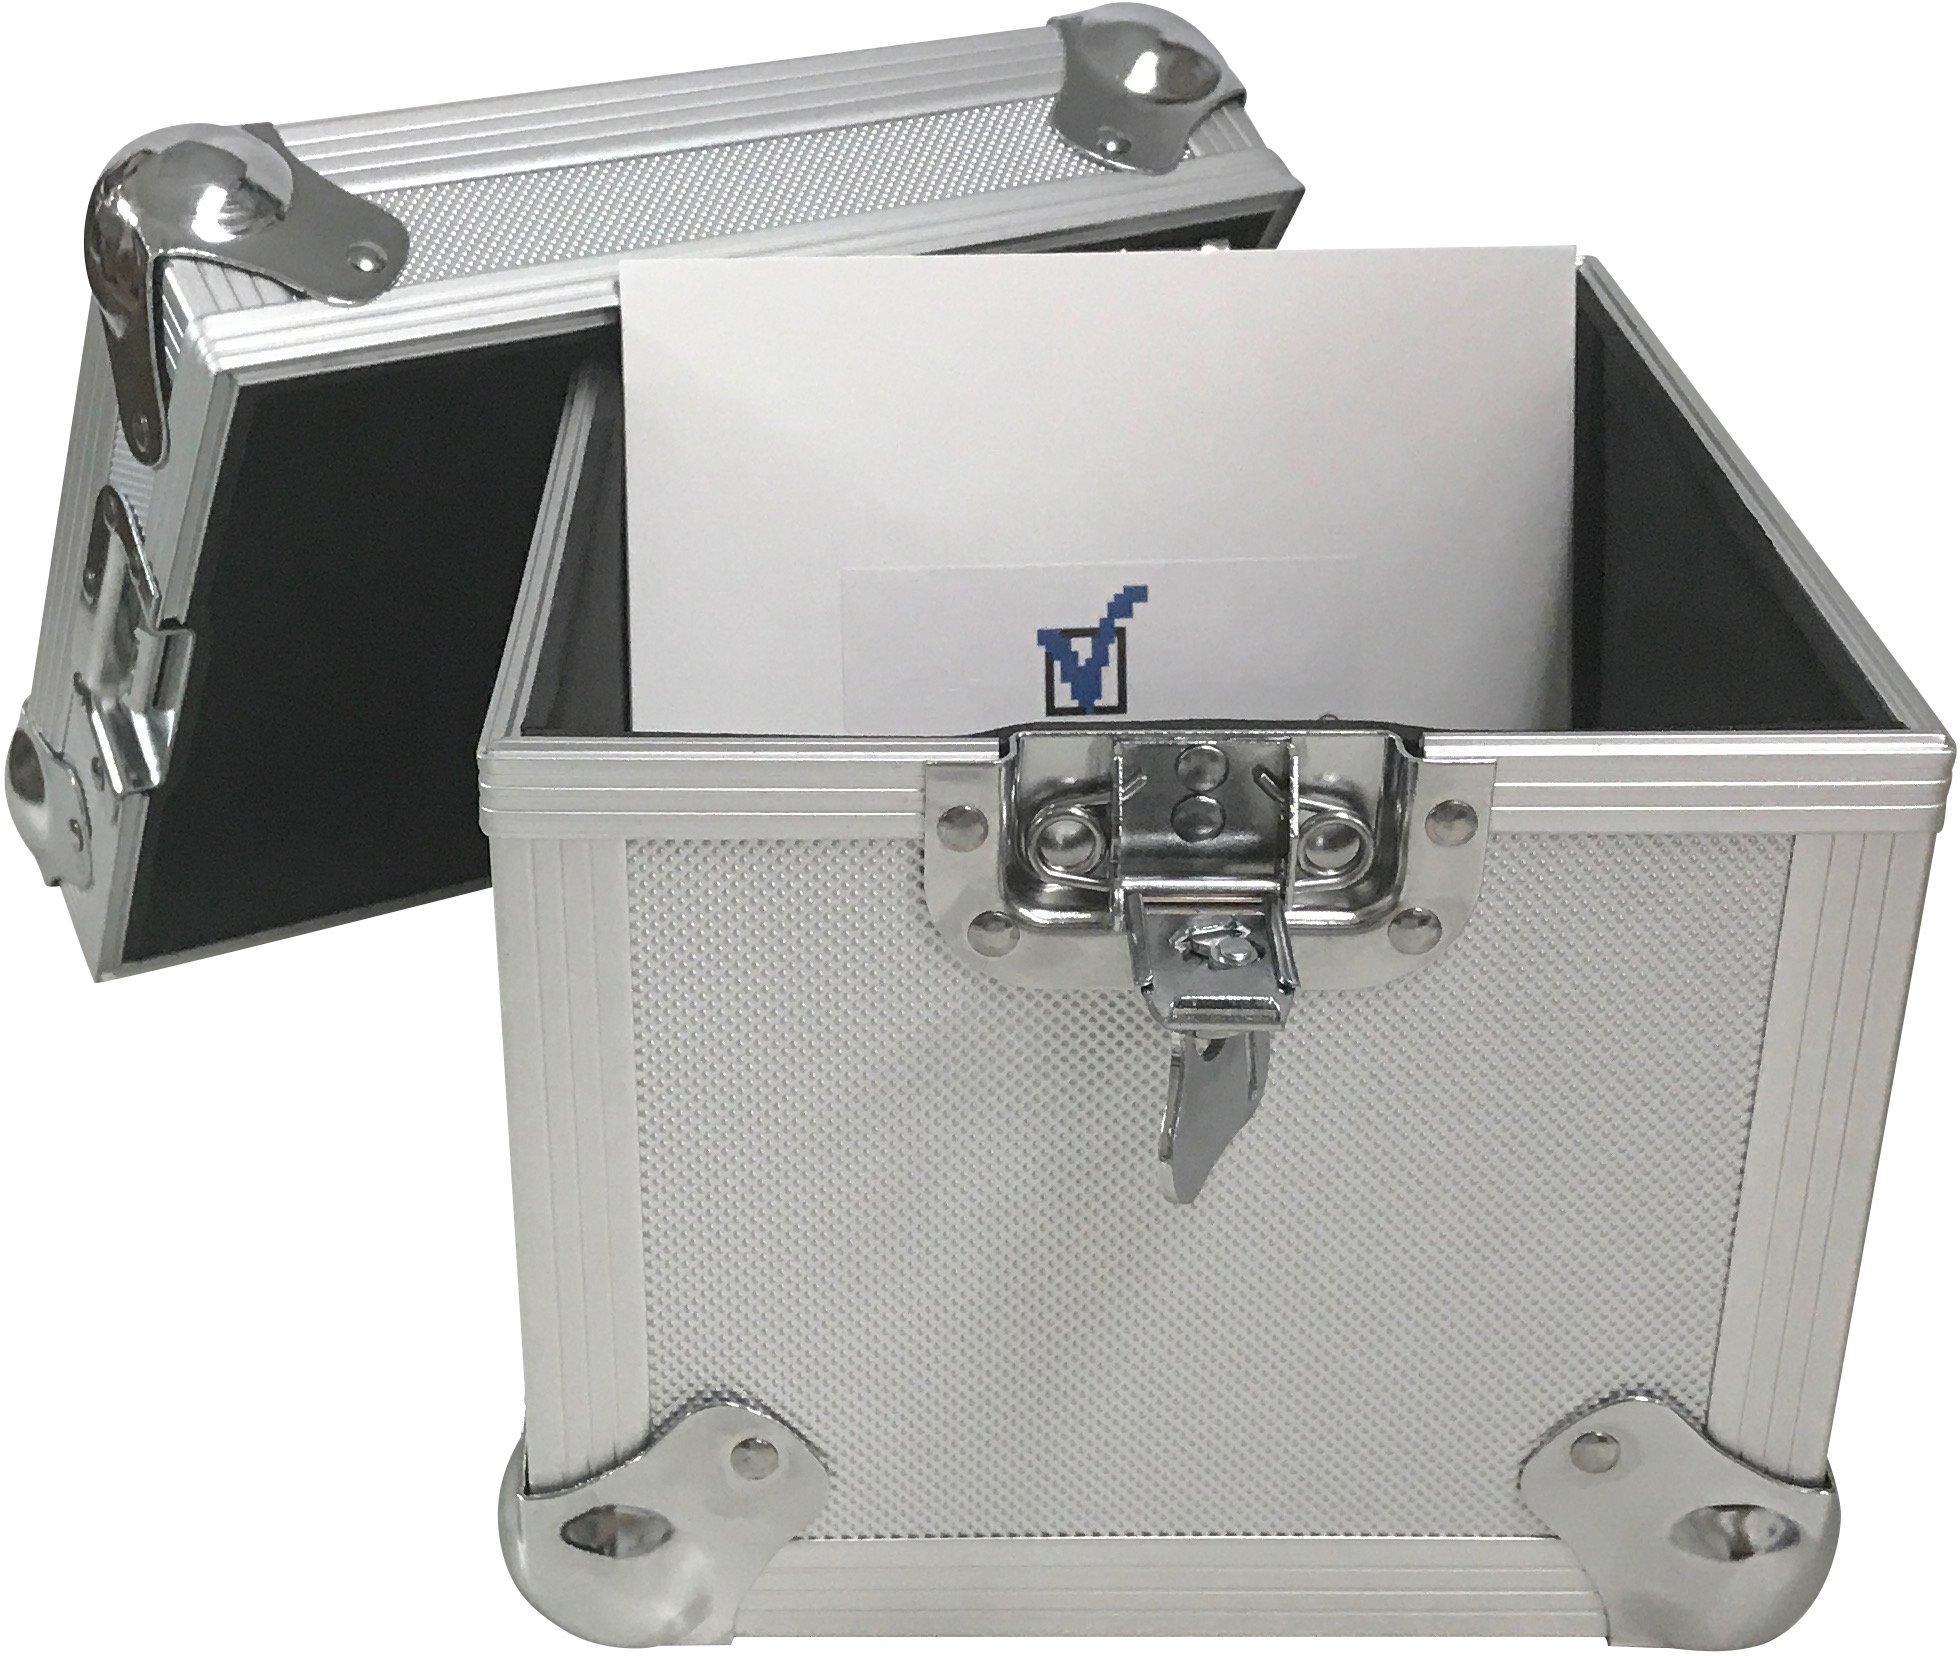 (2) CheckOutStore Aluminum Heavy Duty 7'' LP Vinyl Record Album Storage Box (Silver / Holds 100 Records)